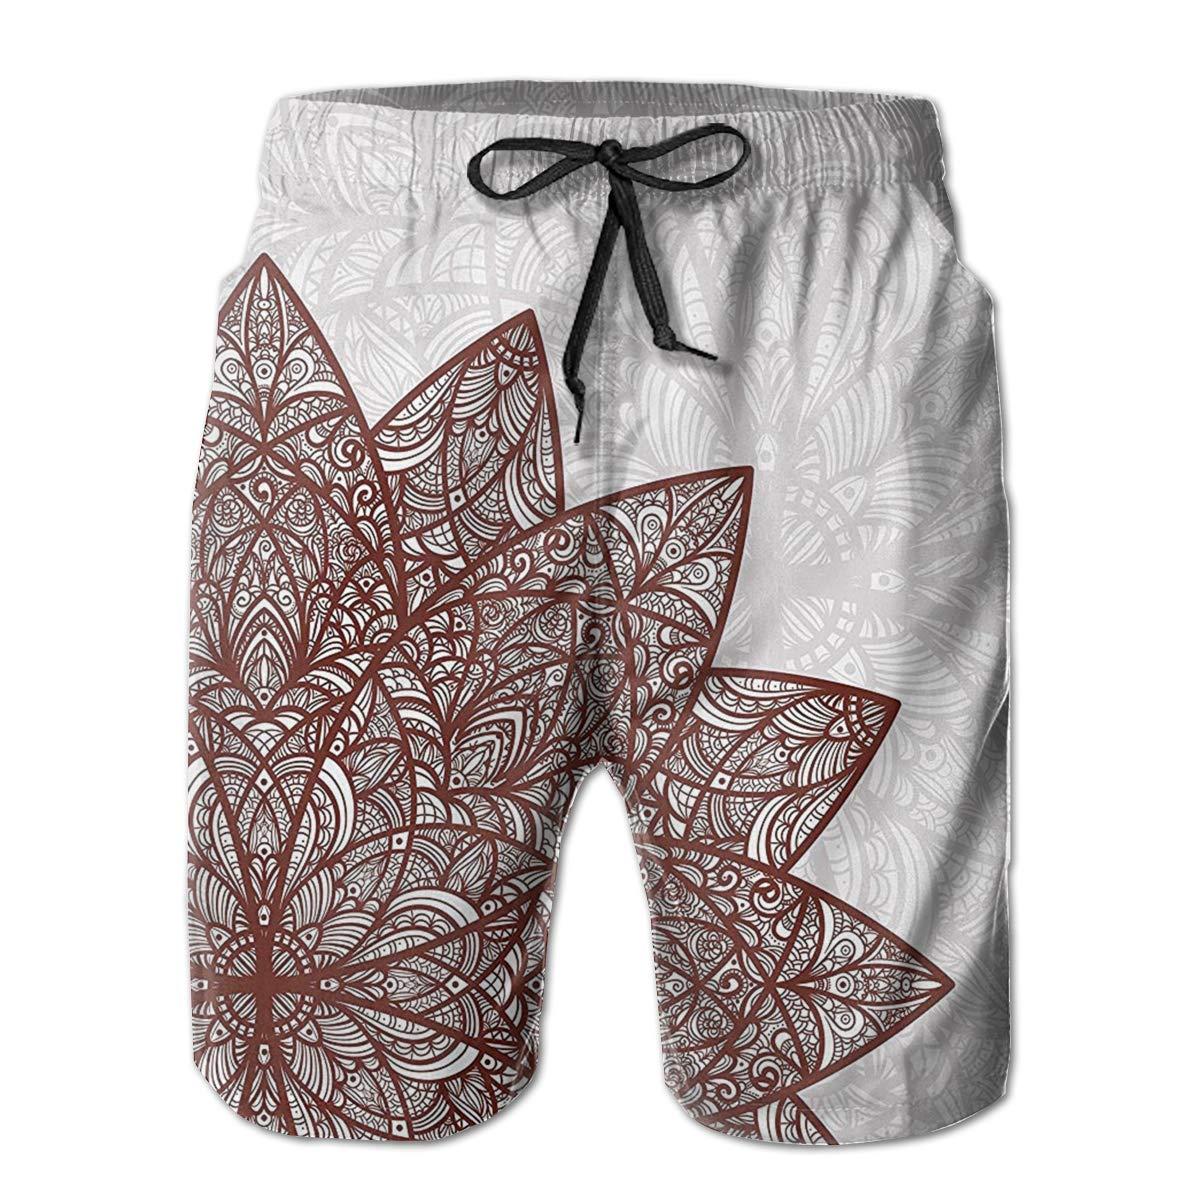 Bilybily Arabesque Floral Figure Mandala Mens Swim Trunks Quick Dry Board Shorts with Pockets Summer Beach Shorts